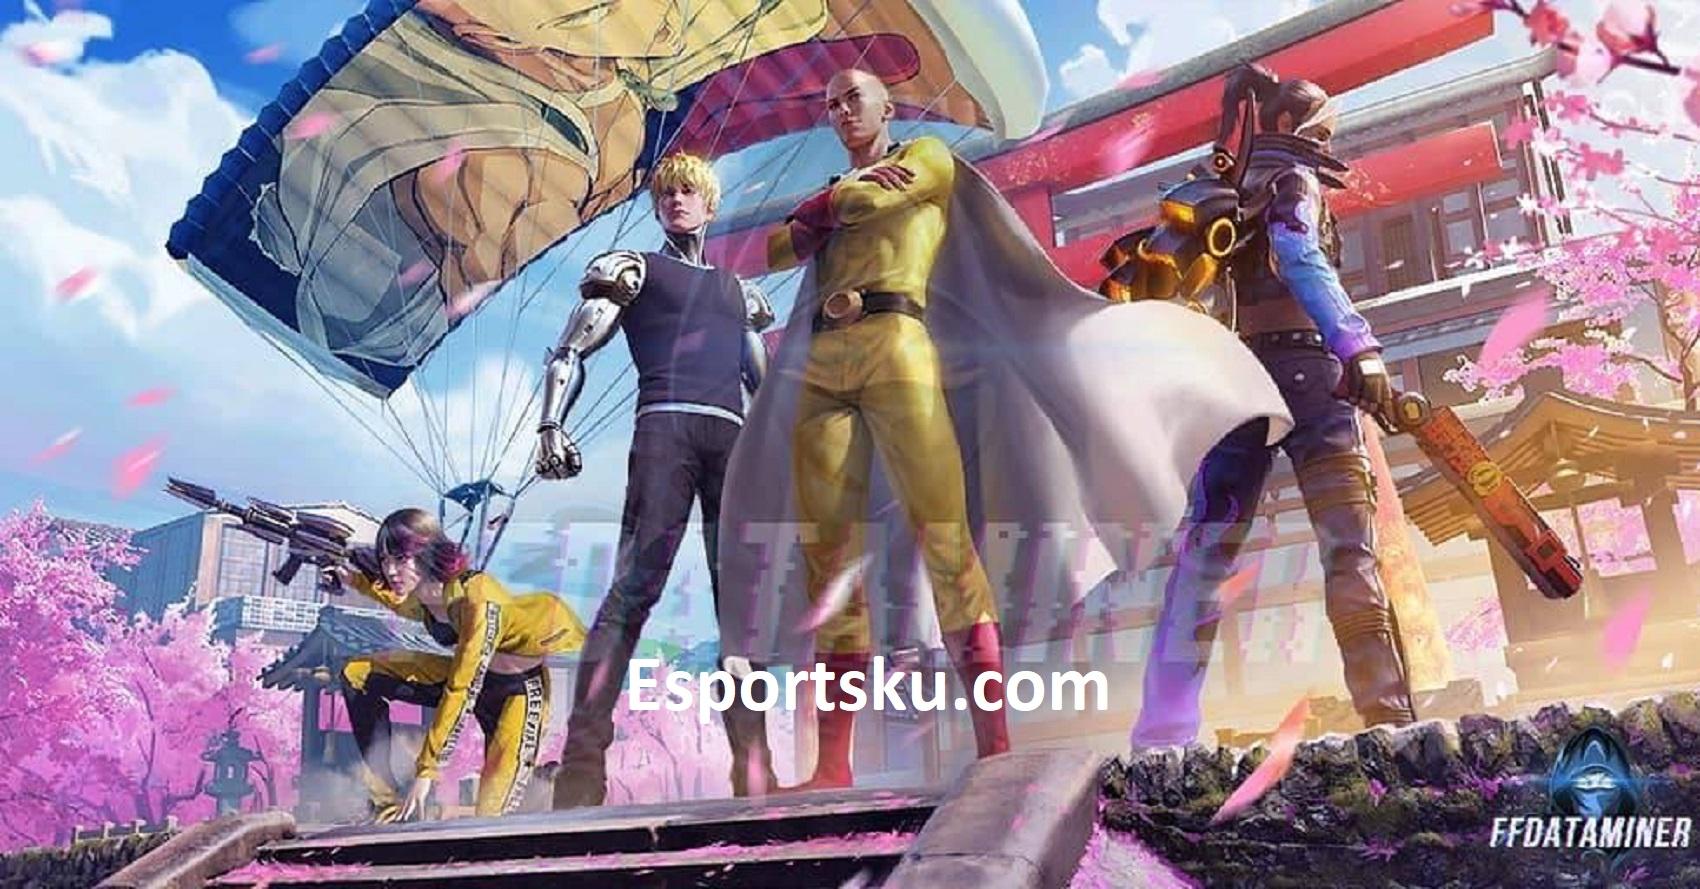 Wallpaper Free Fire X One Punch Man Keren Di Ff Esportsku